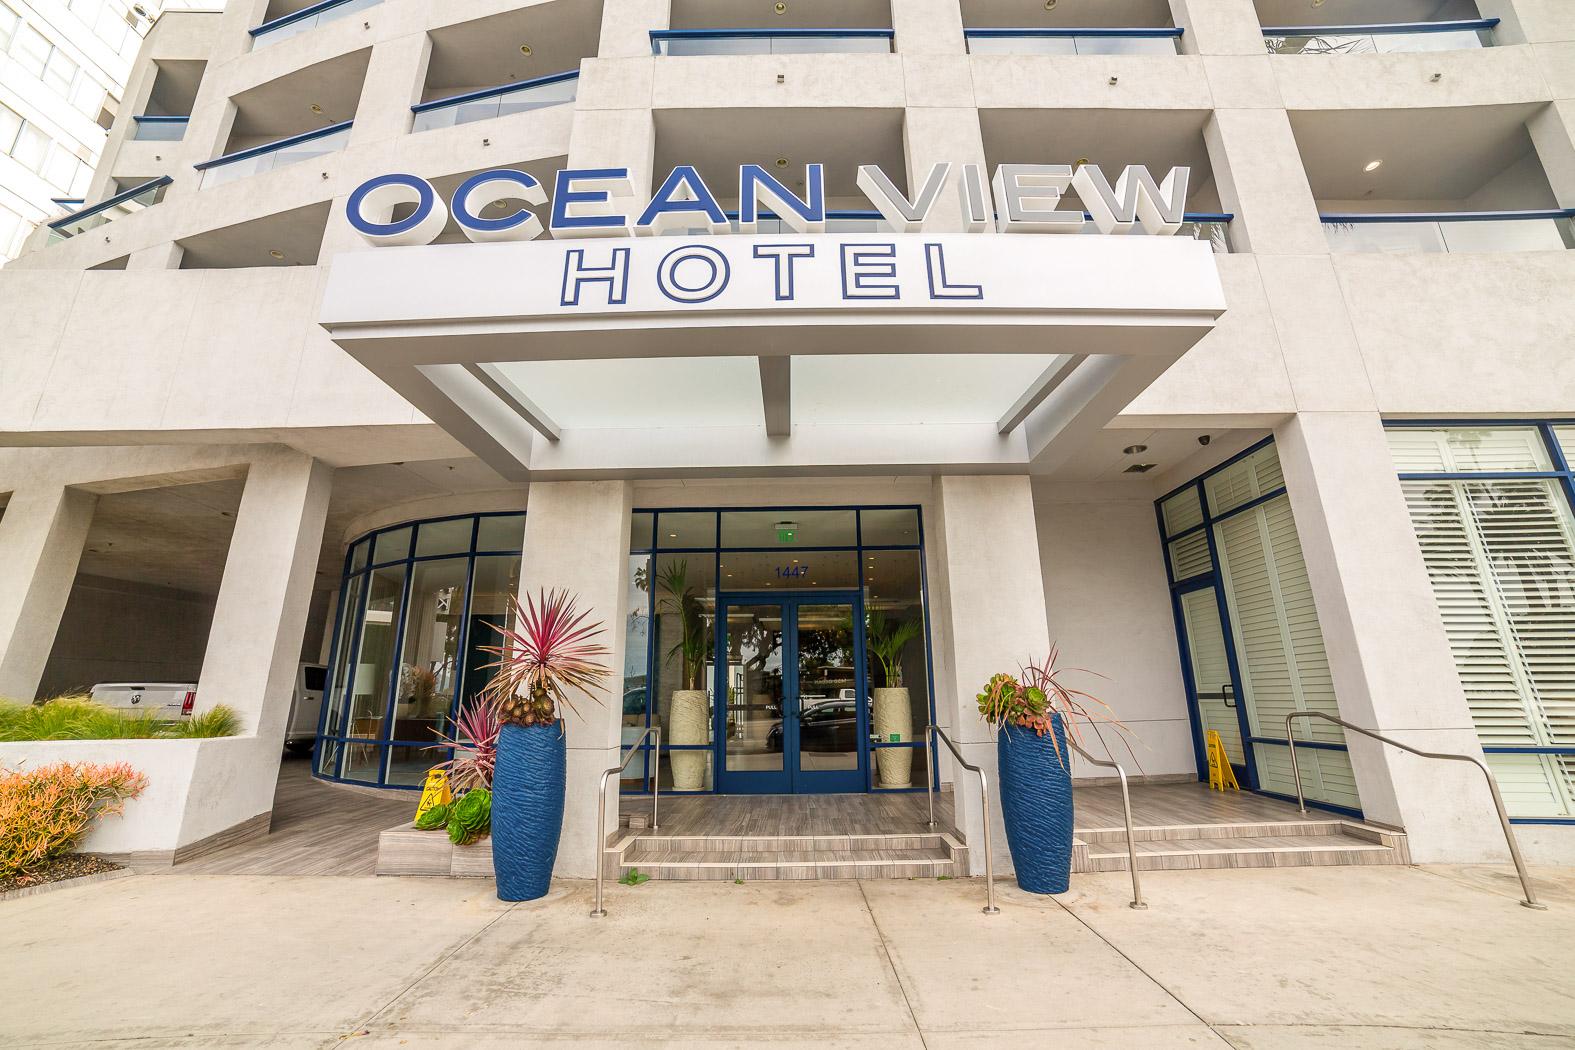 Ocean View Hotel - Santa Monica, CA 90401 - (310)458-4888 | ShowMeLocal.com